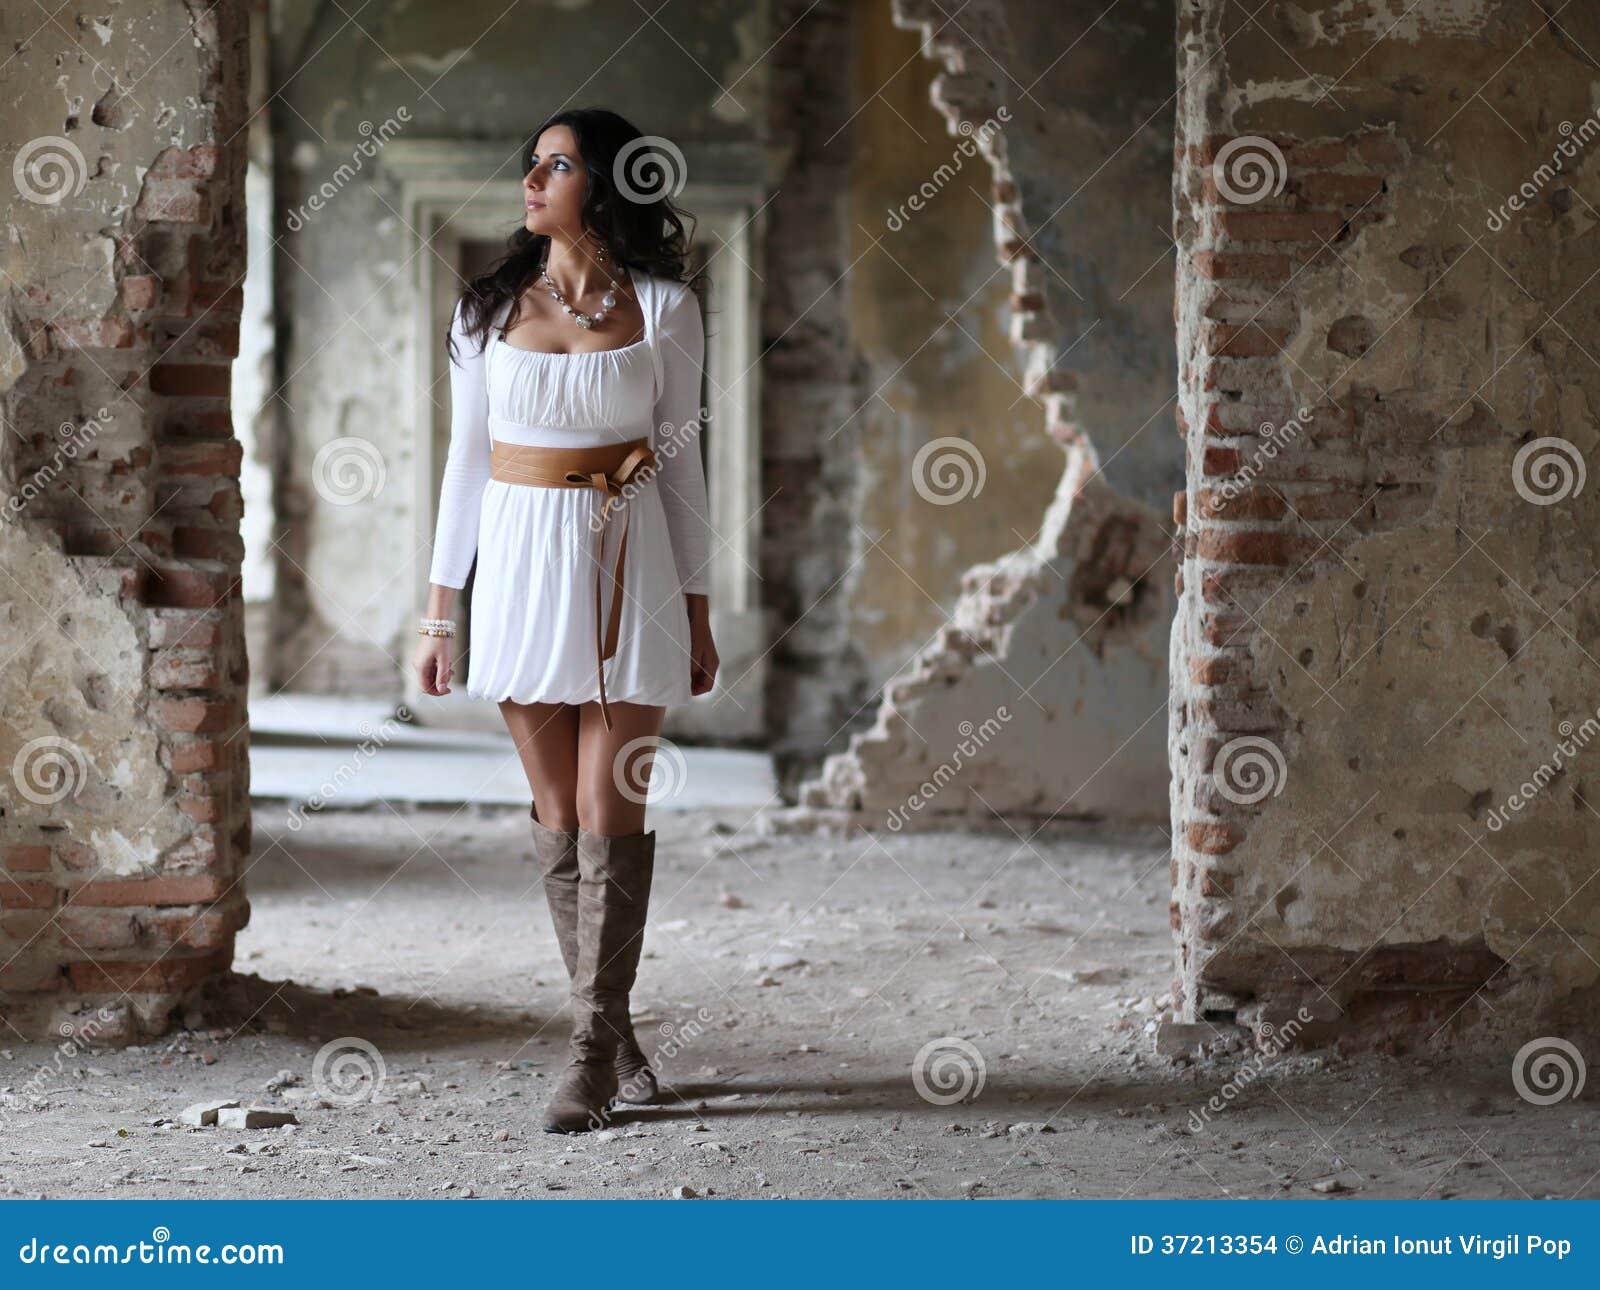 Woman Walking Trough Multiple Doors Stock Images